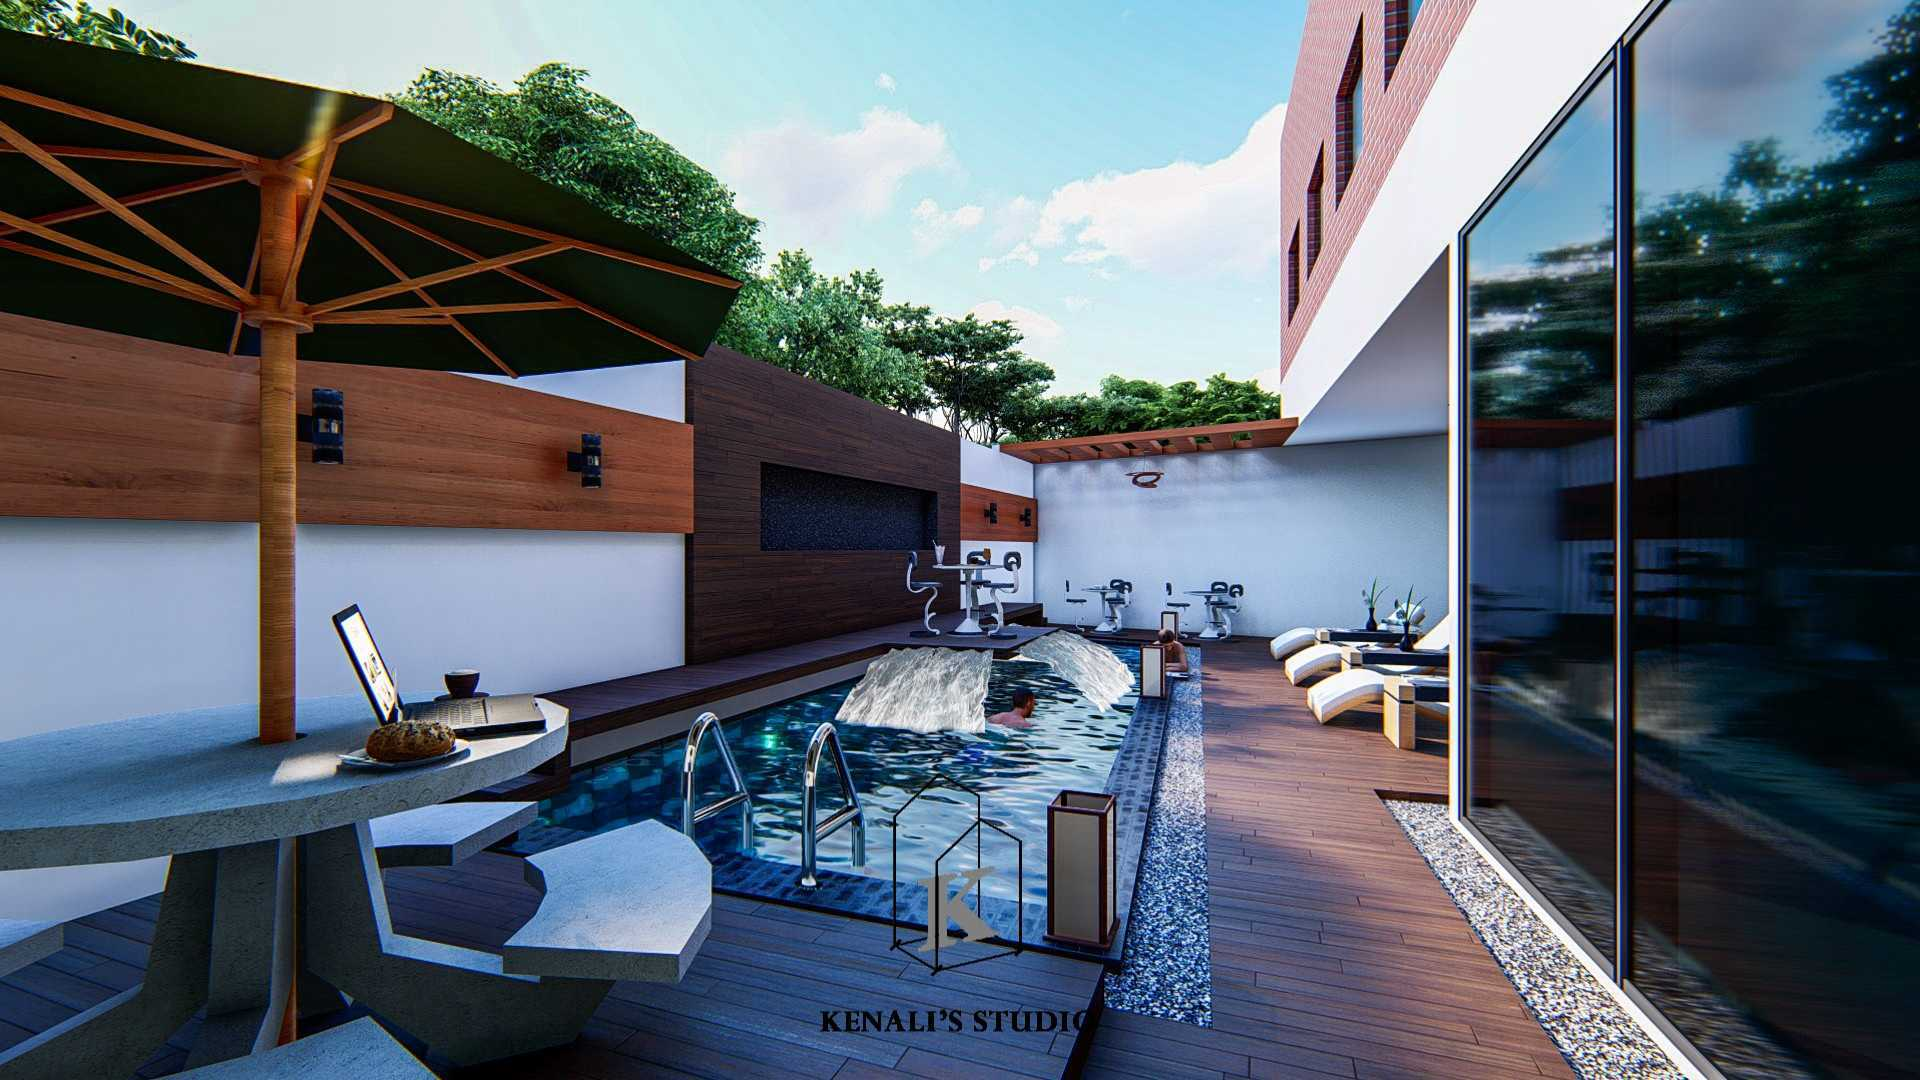 "Kenali's Studio ""hidden Treasure"" Project : Swimming Pool Kuwait Kuwait Kenalis-Studio-Hidden-Treasure-Project-Swimming-Pool   72942"